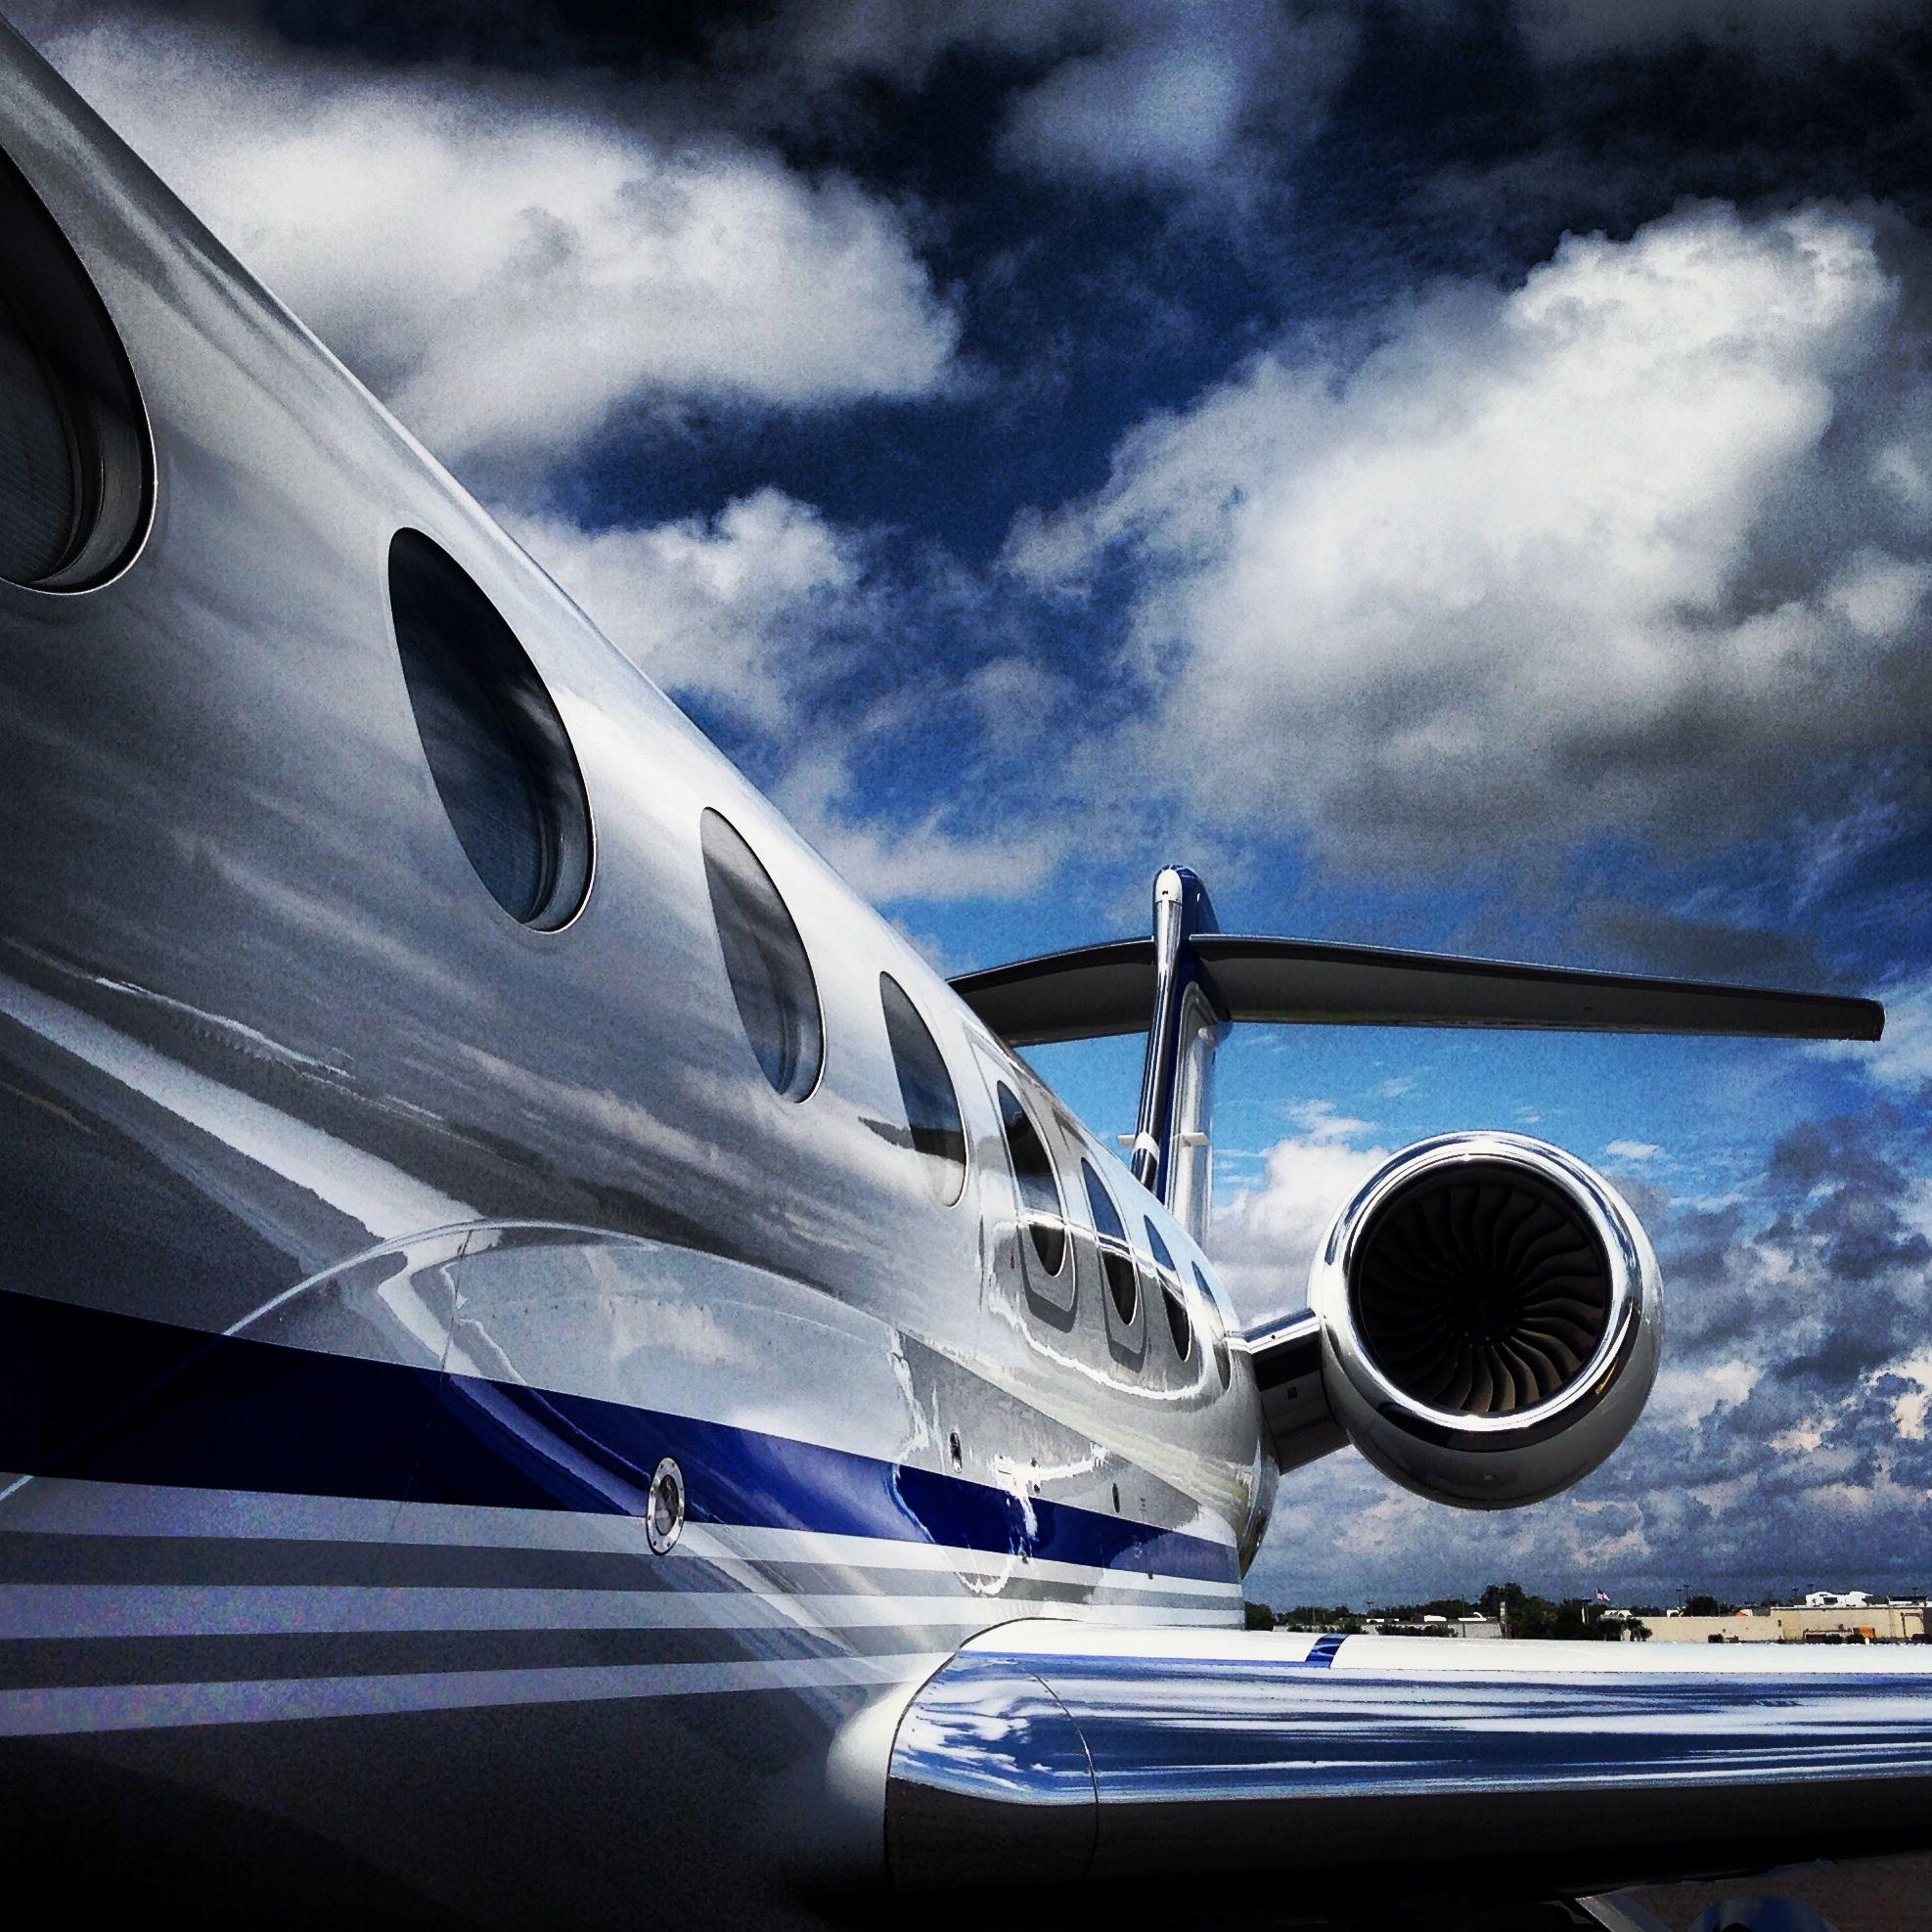 Gulfstream G650 Private Charter Flights Gulfstream g650